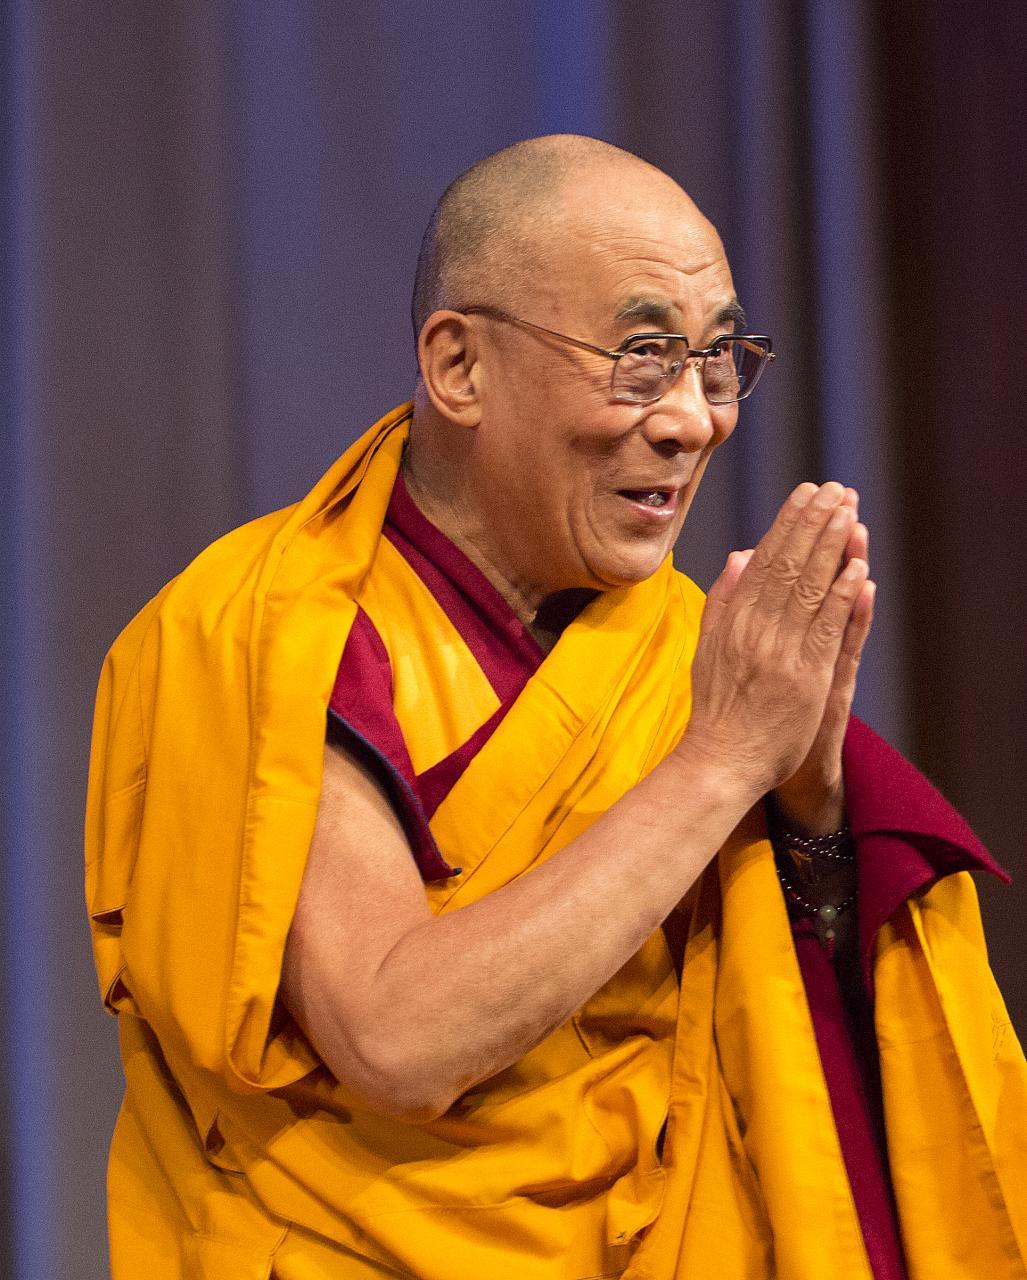 Fichier:Dalai Lama @ MIT (8094663758).jpg — Wikipédia